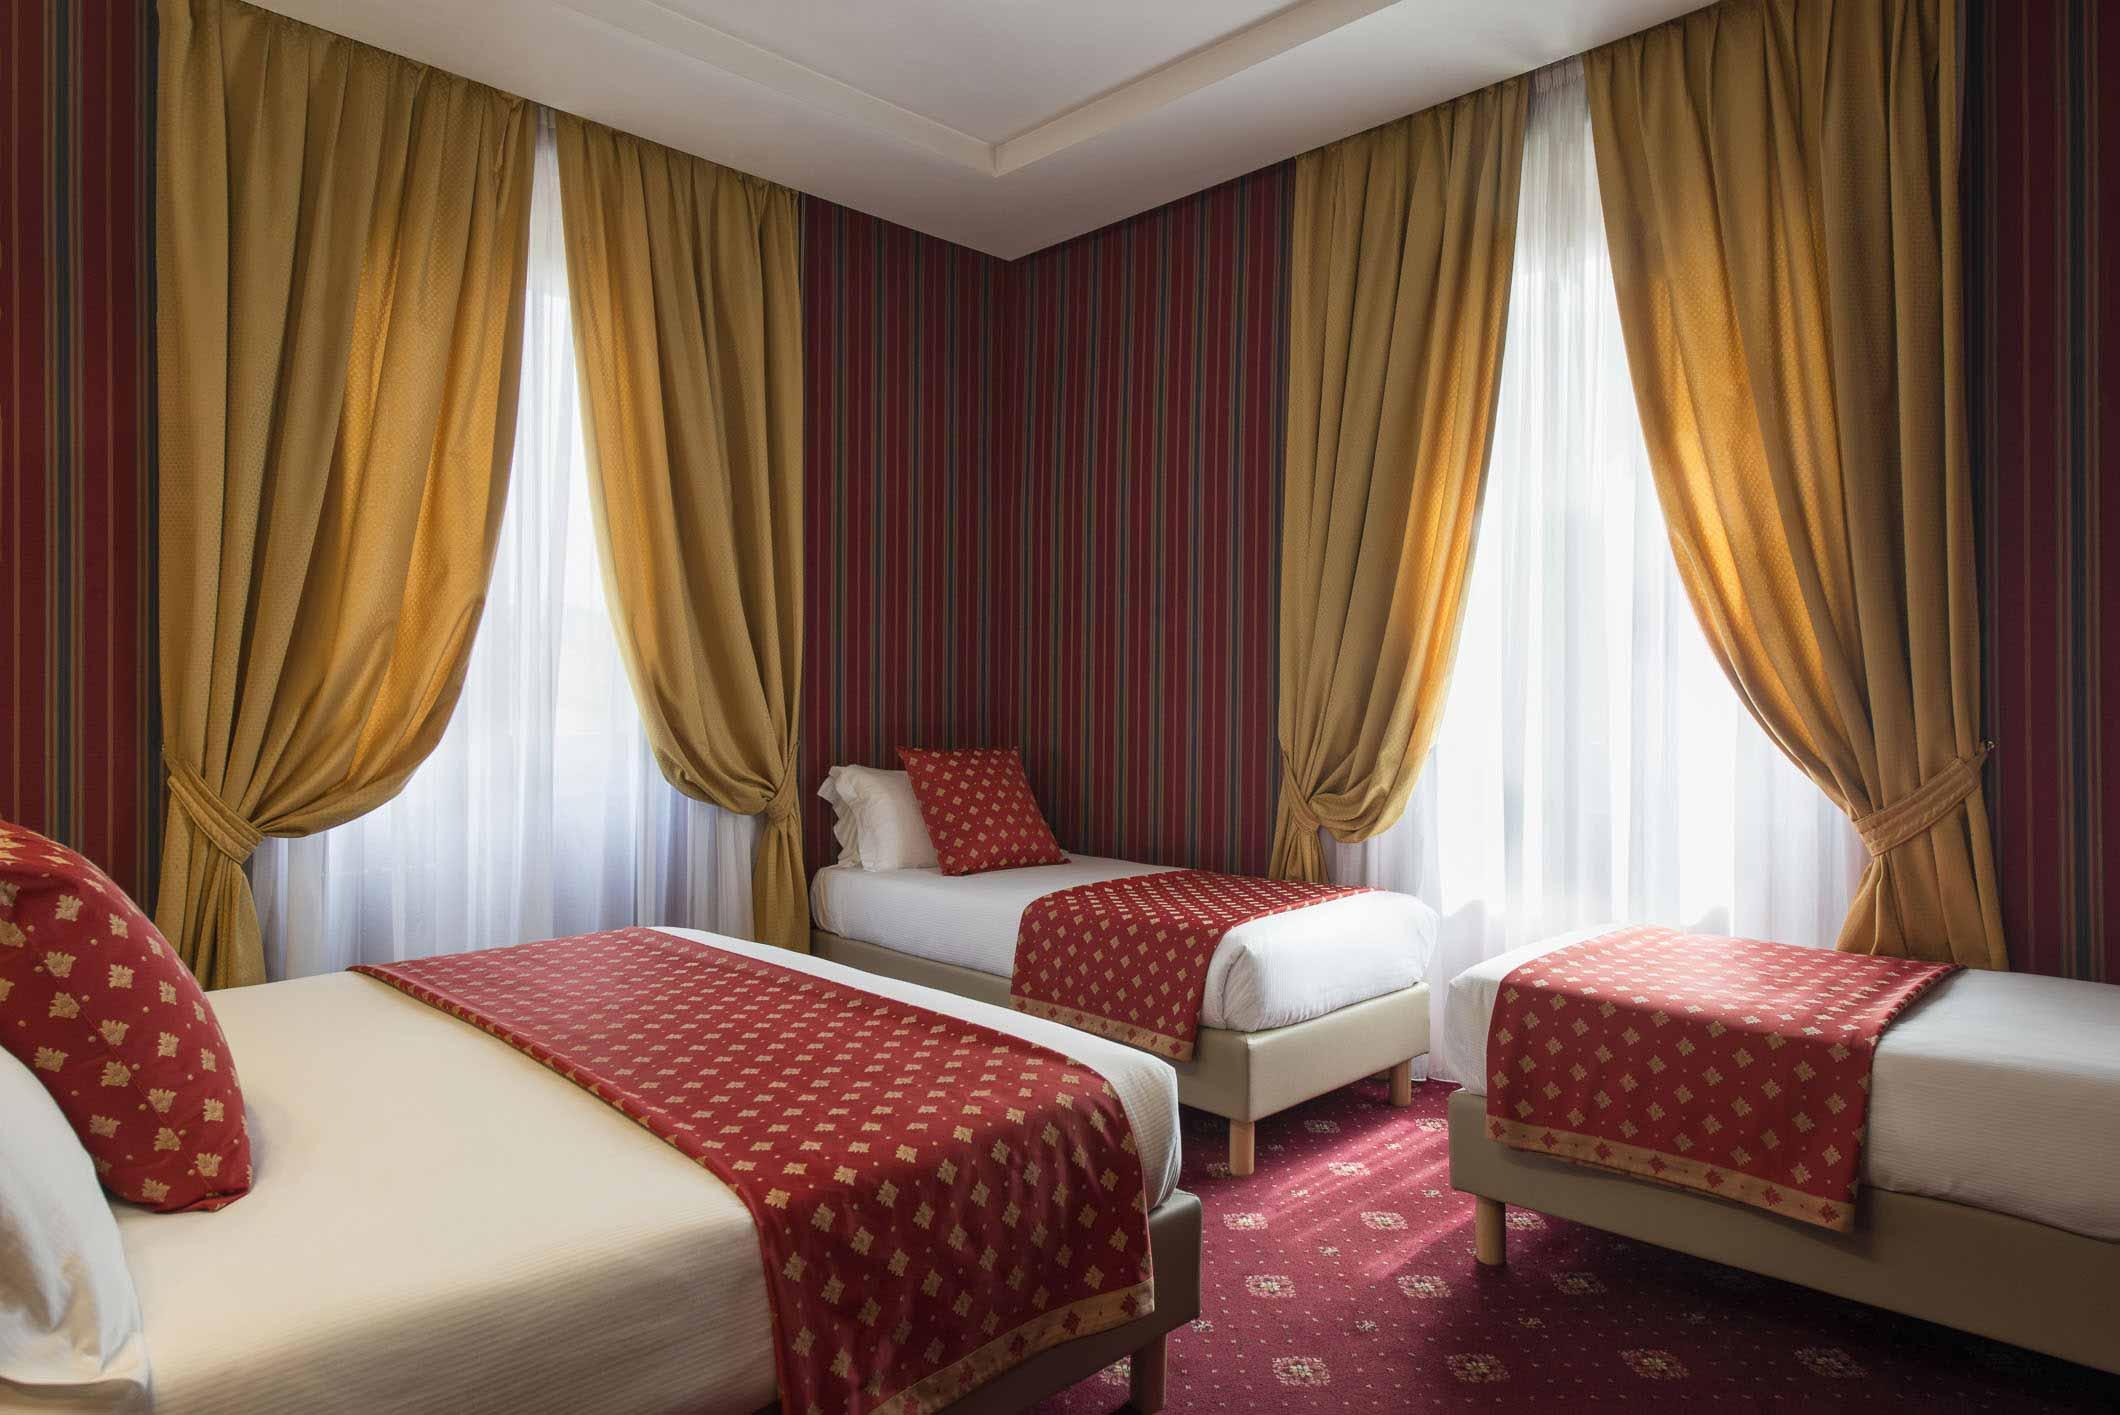 Fotografo per hotel a Roma – Atlante Garden #05